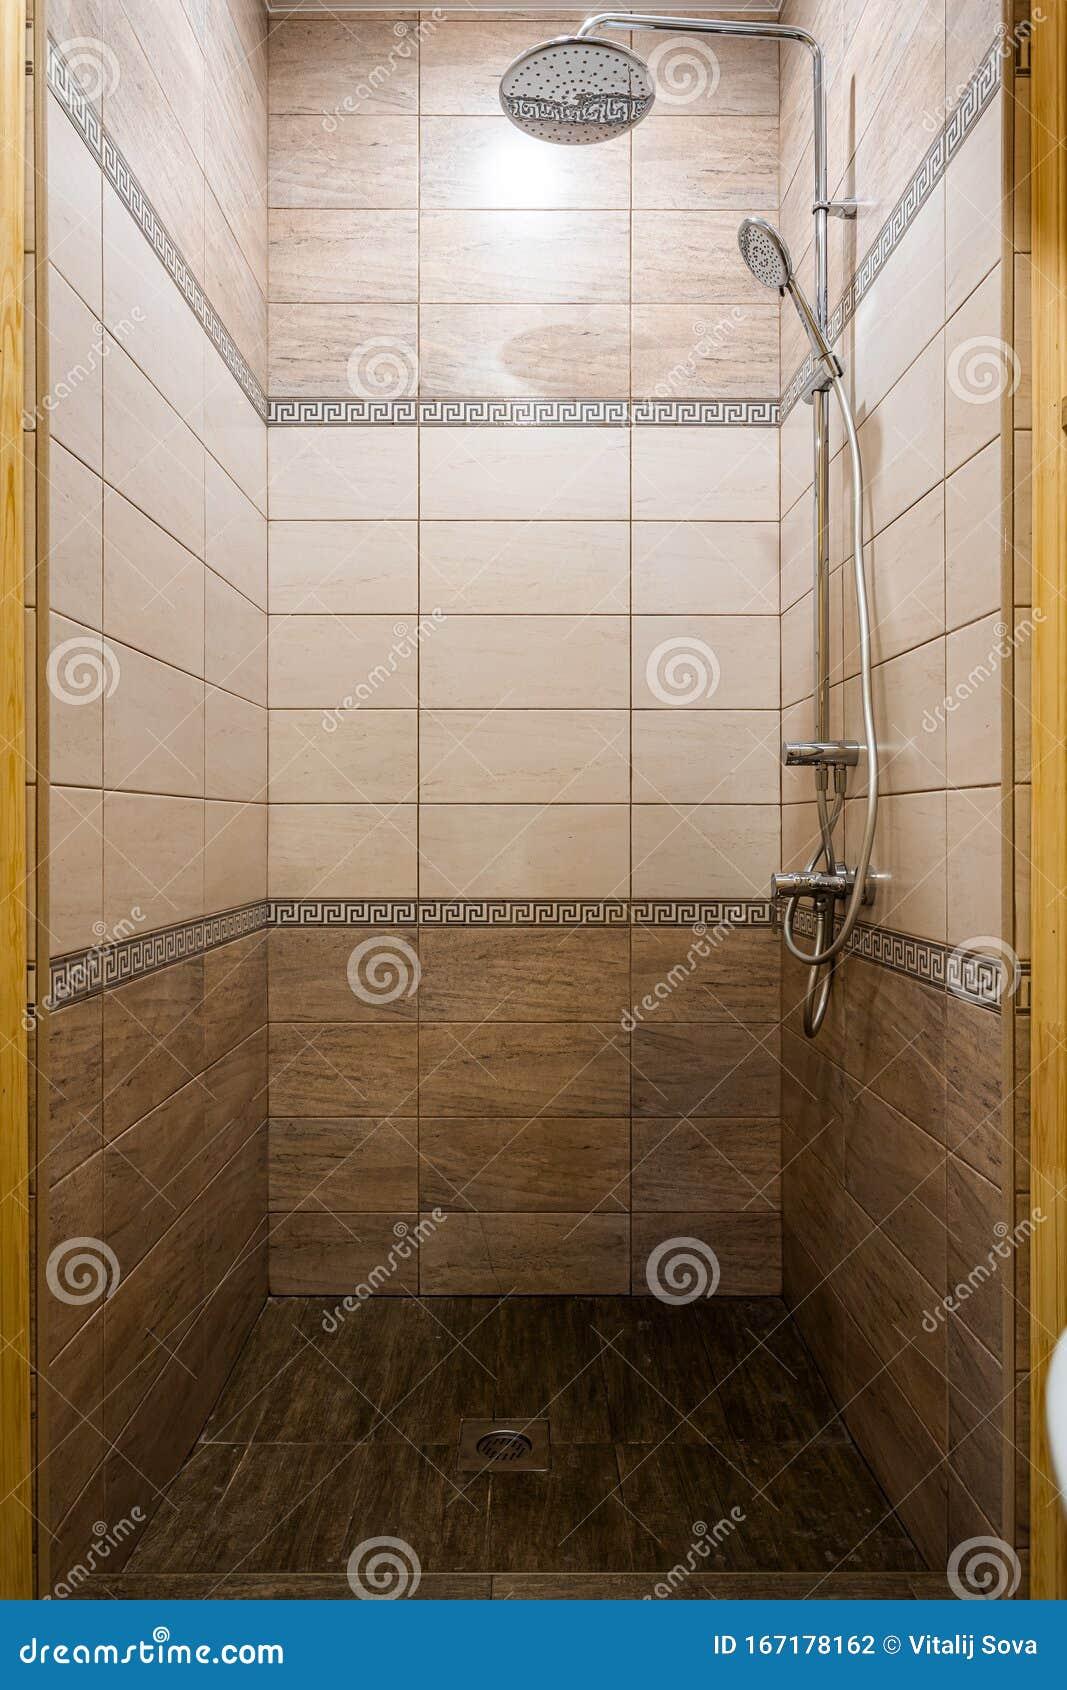 Minimalist Hotel Room: Minimalist Shower Room With Hotel Sauna Stock Photo